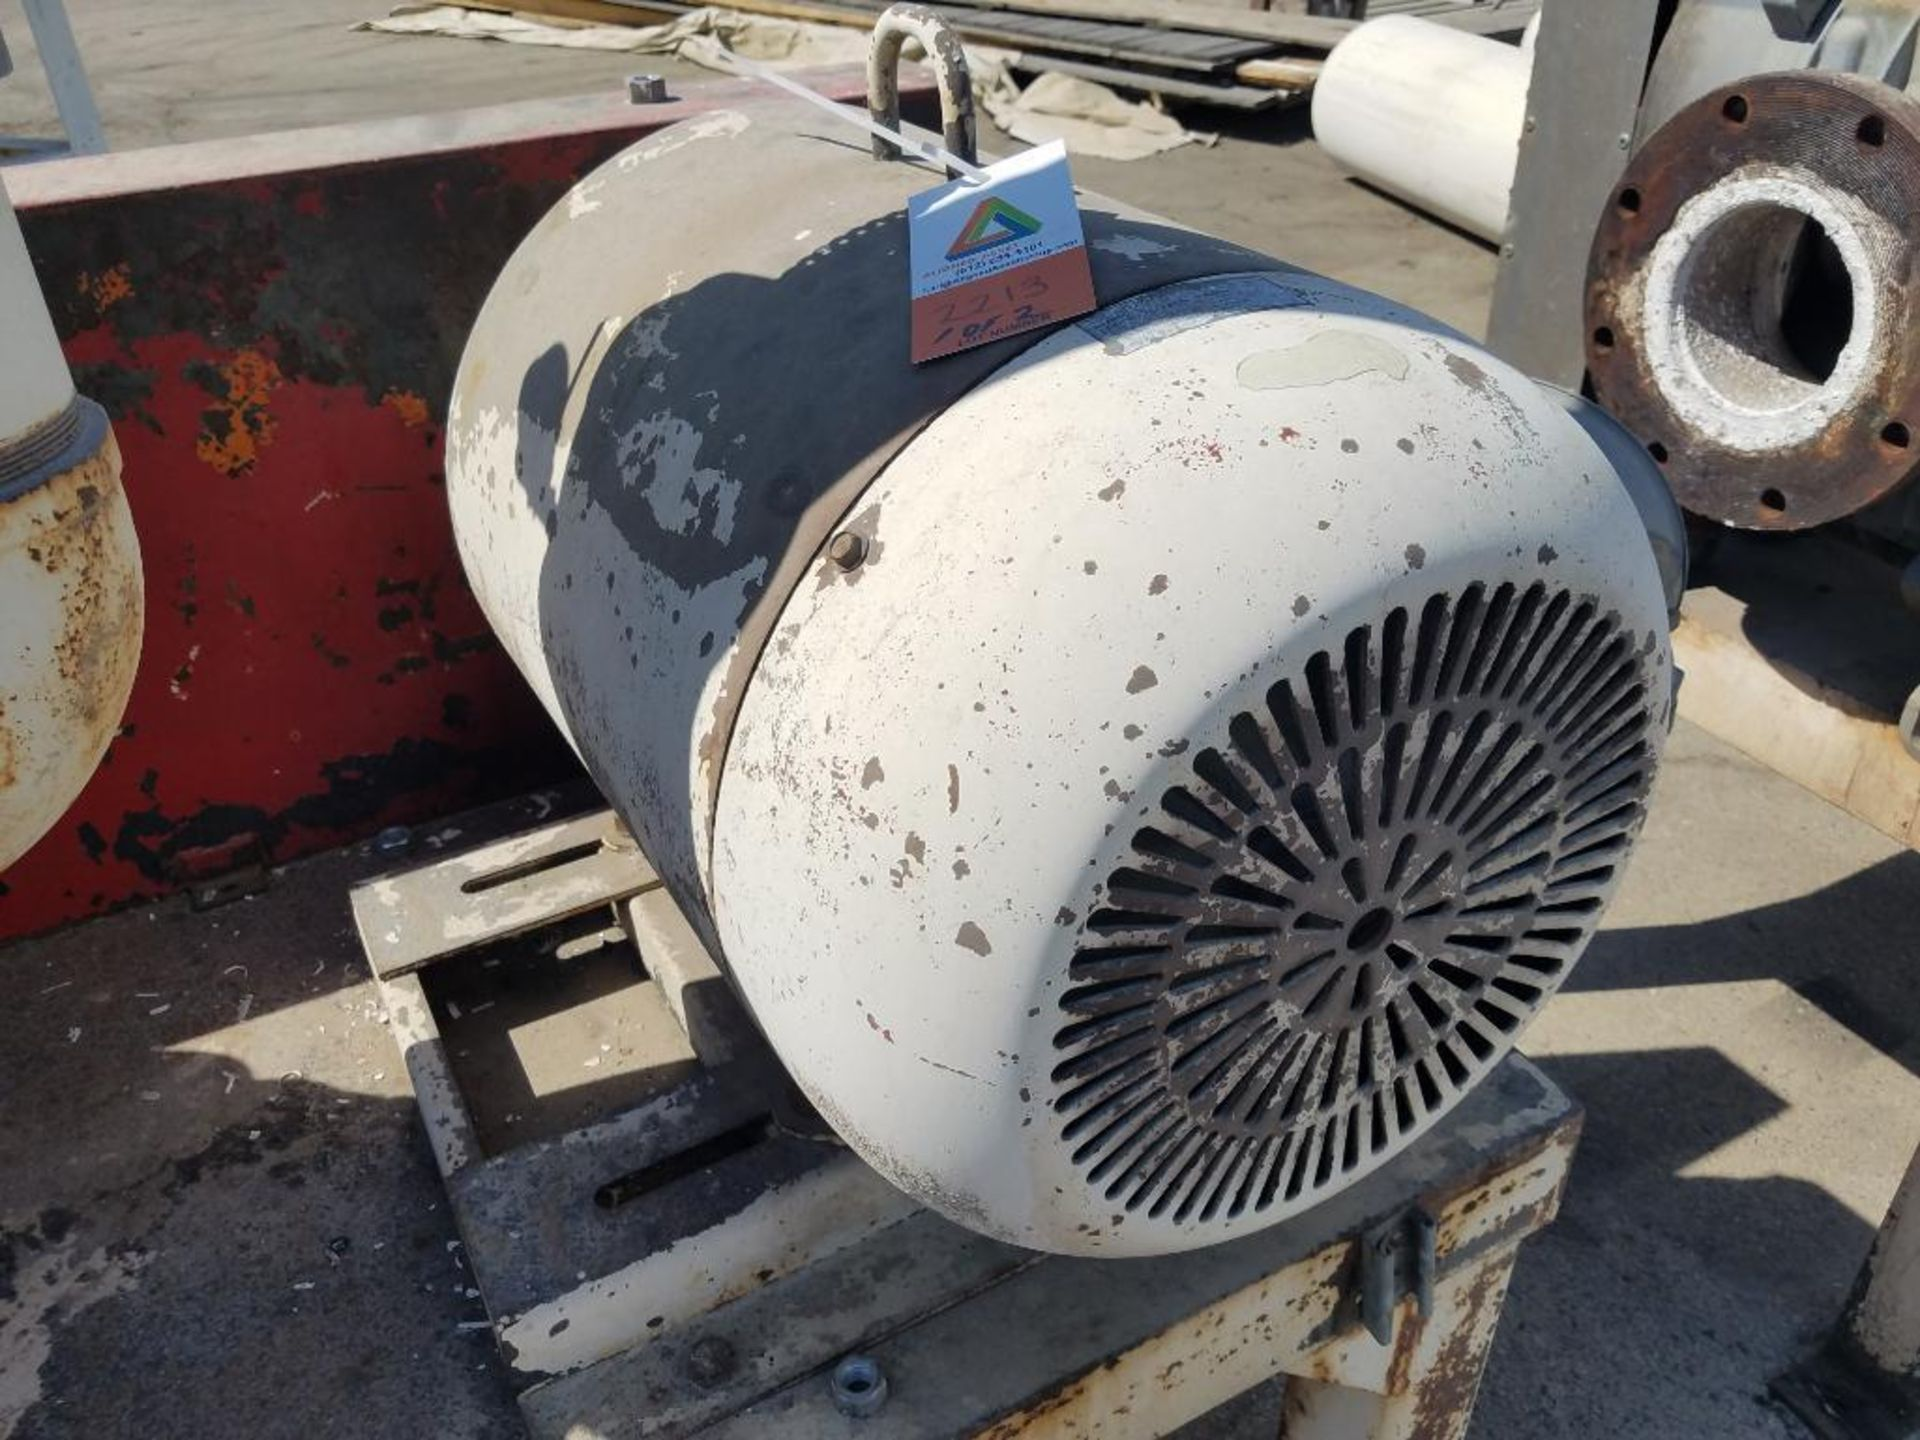 Sutorbilt rotary positive blower - Image 4 of 7